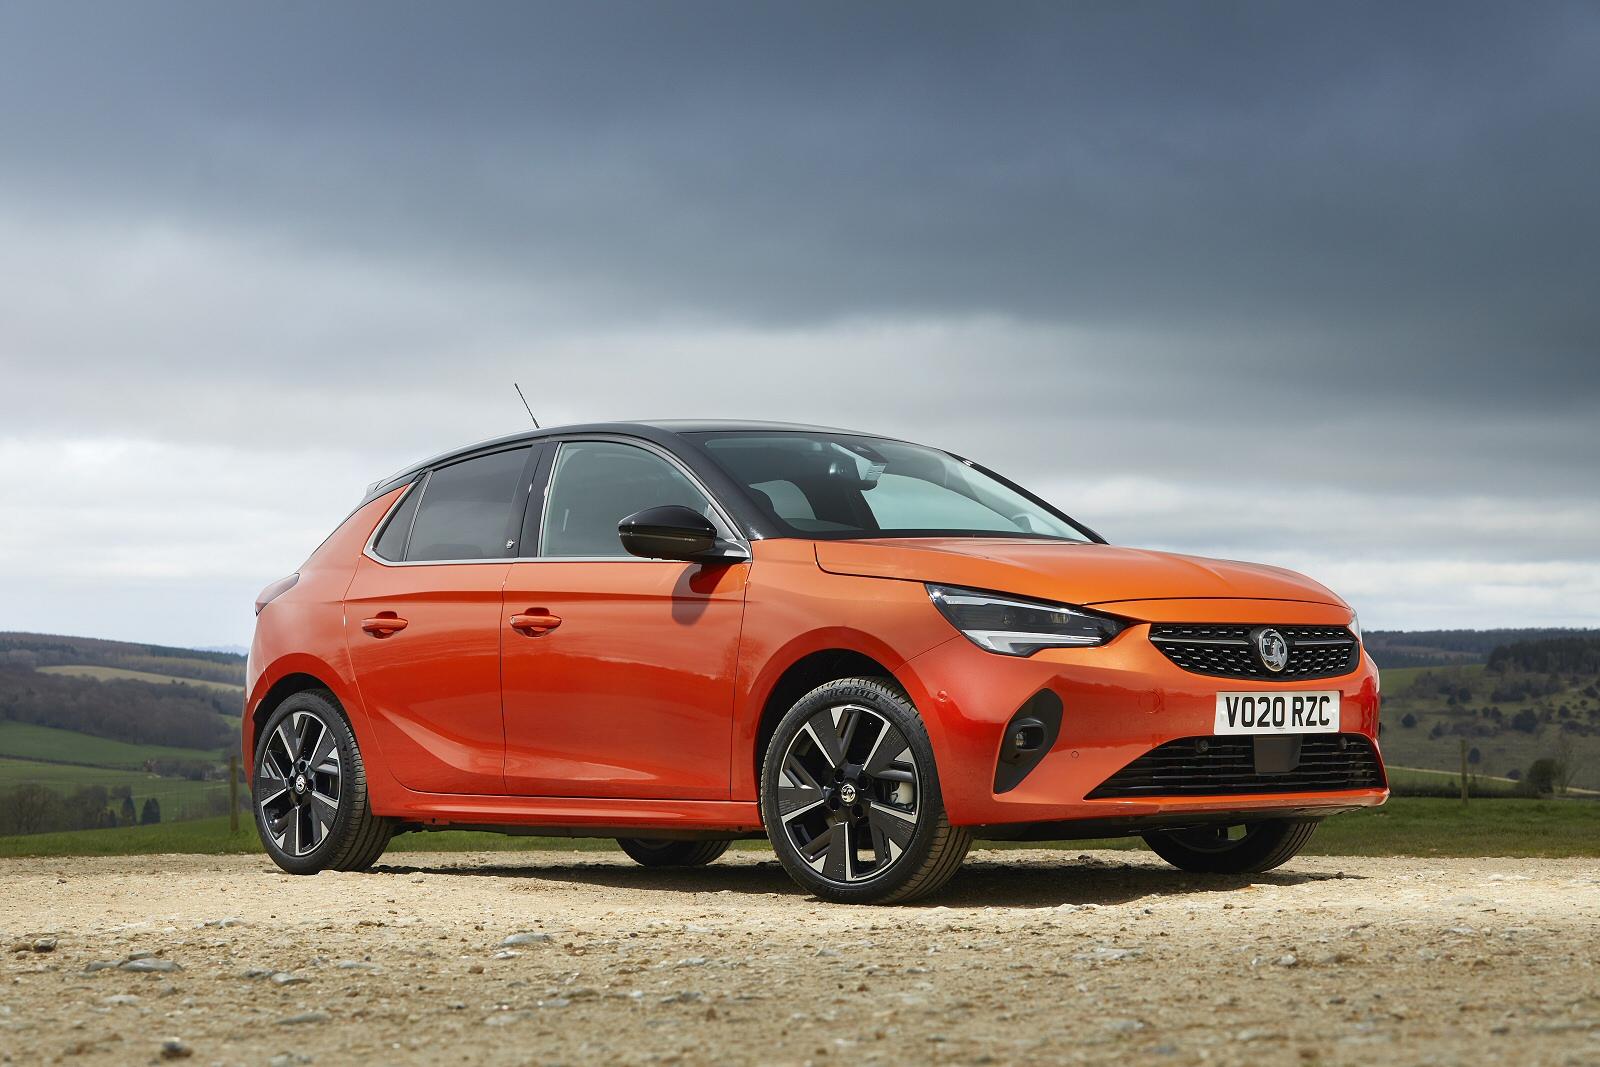 Vauxhall Corsa-e Electric Hatchback